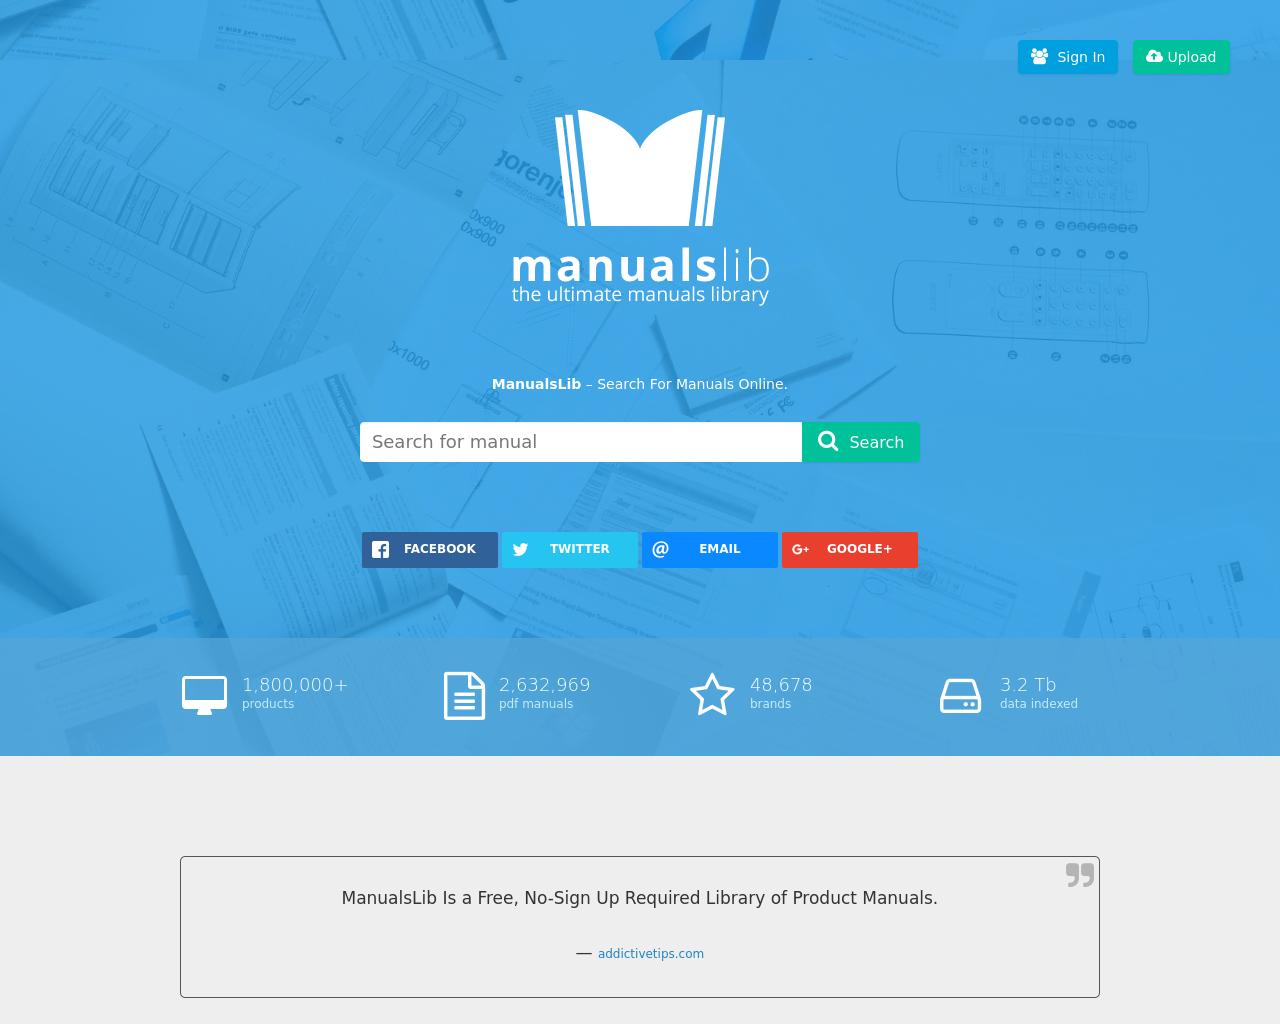 manualslib-Advertising-Reviews-Pricing